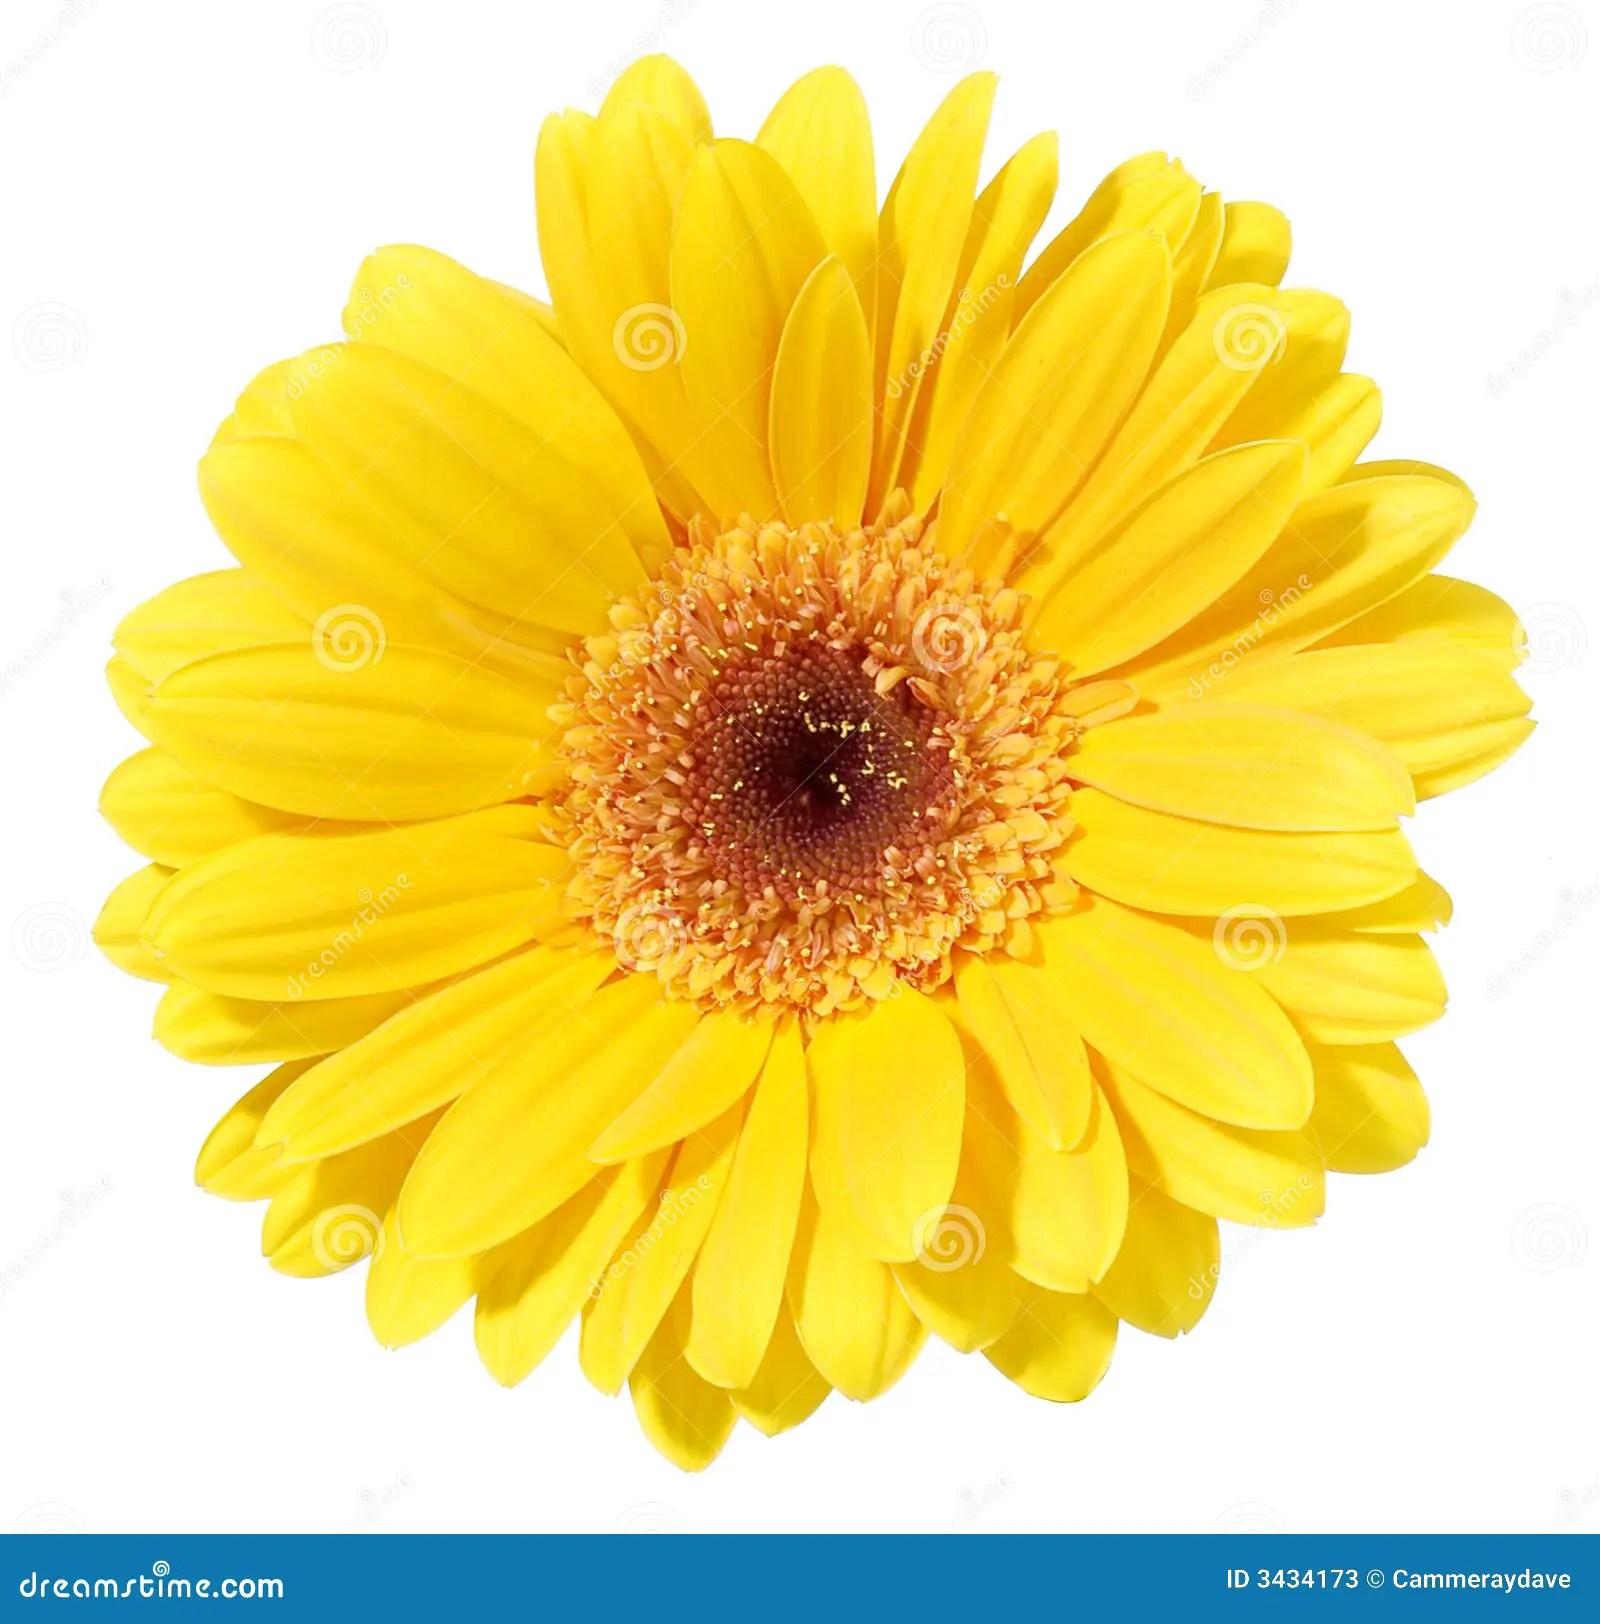 Black Abstract Wallpaper Yellow Gerbera Flower Stock Photos Image 3434173